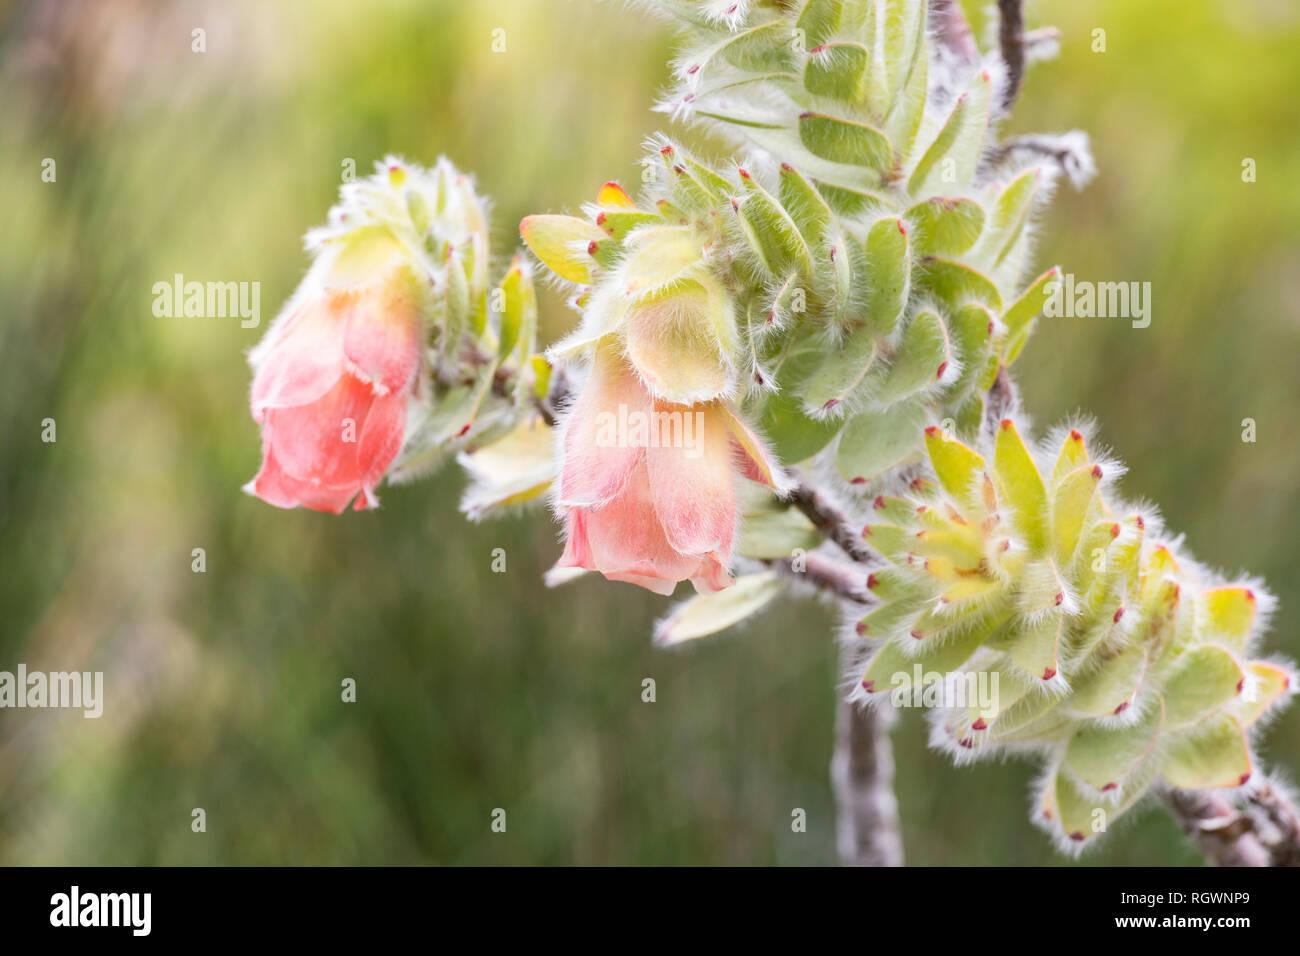 Rare Marsh Rose, Orothamnus zeyheri, a vulnerable mountain fynbos species under threat of extinction Kirstenbosch Botanical Gardens , Cape Town, Weste - Stock Image